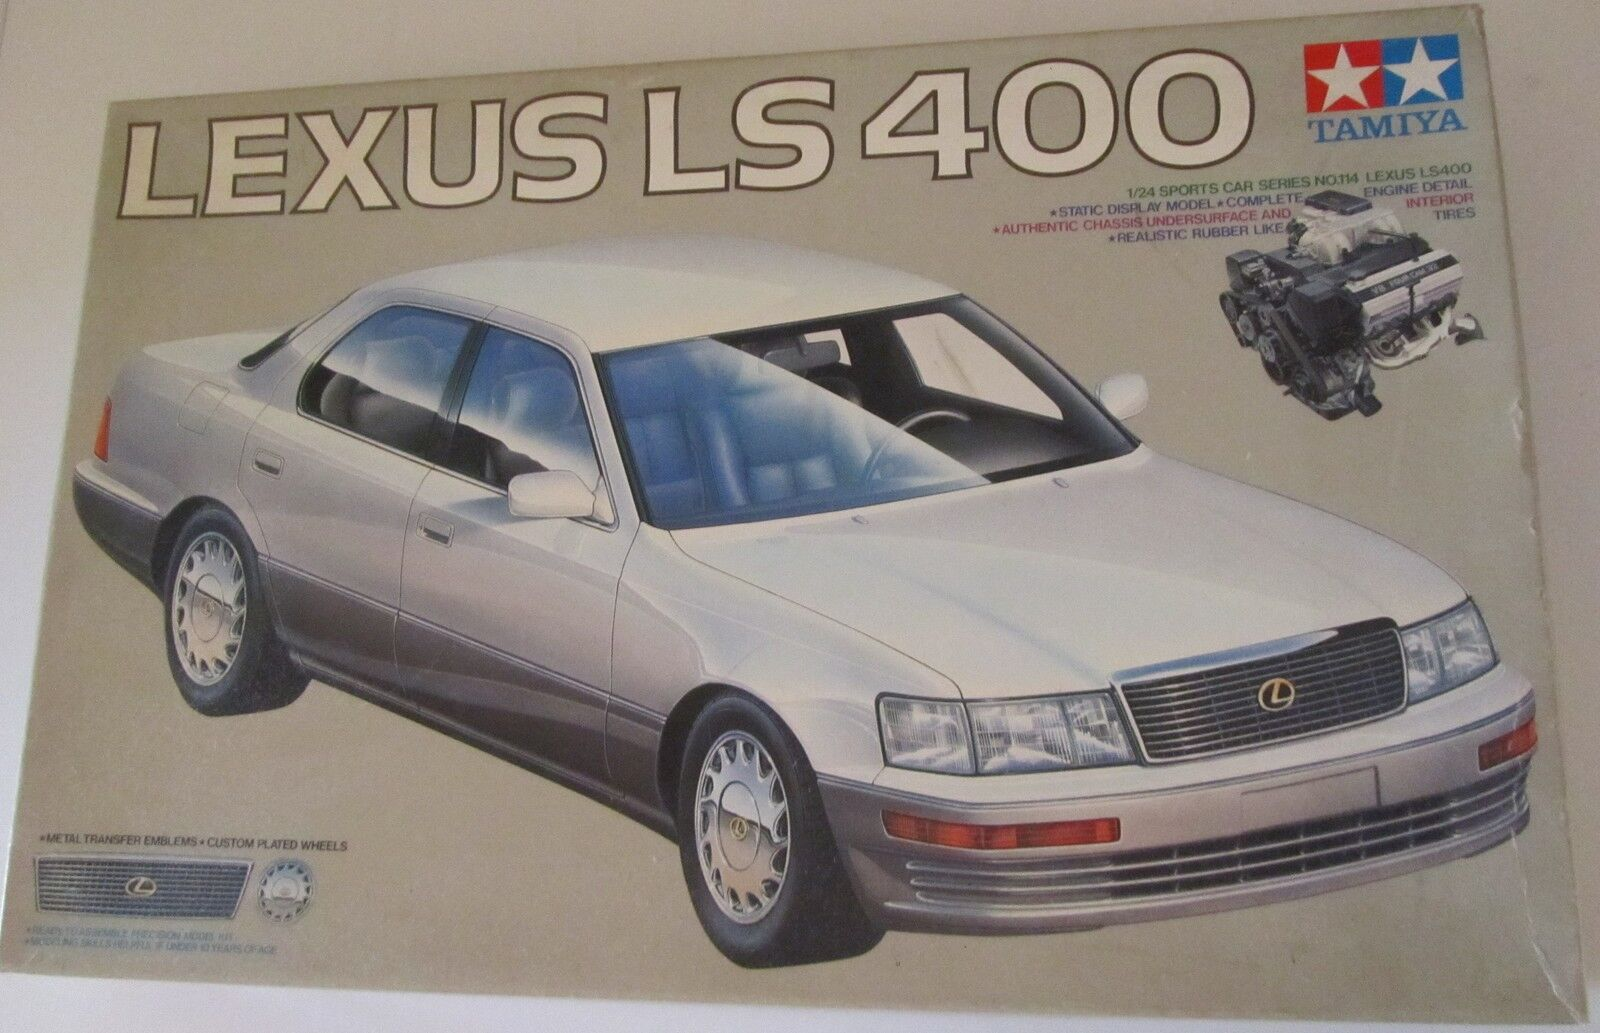 Modellino Tamiya Lexus LS 400 1 24 no. 114